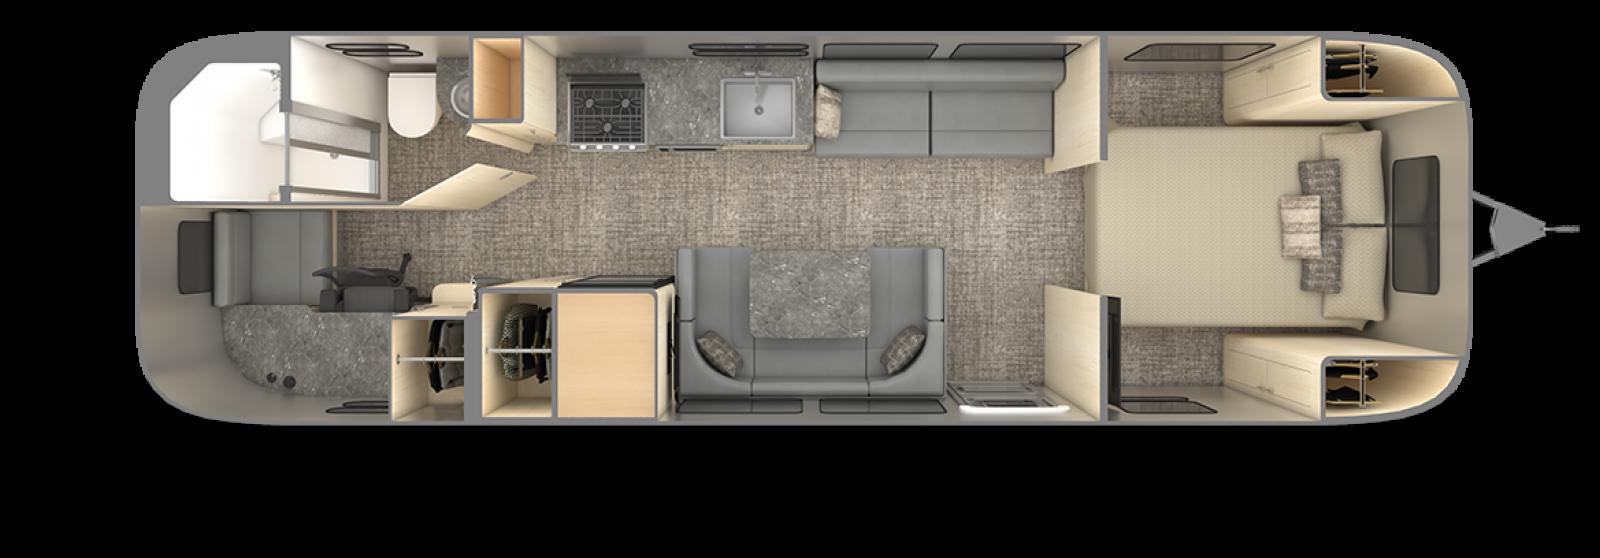 Airstream-Flying-Cloud-30FB-Office-Seattle-Mist-floor-plan